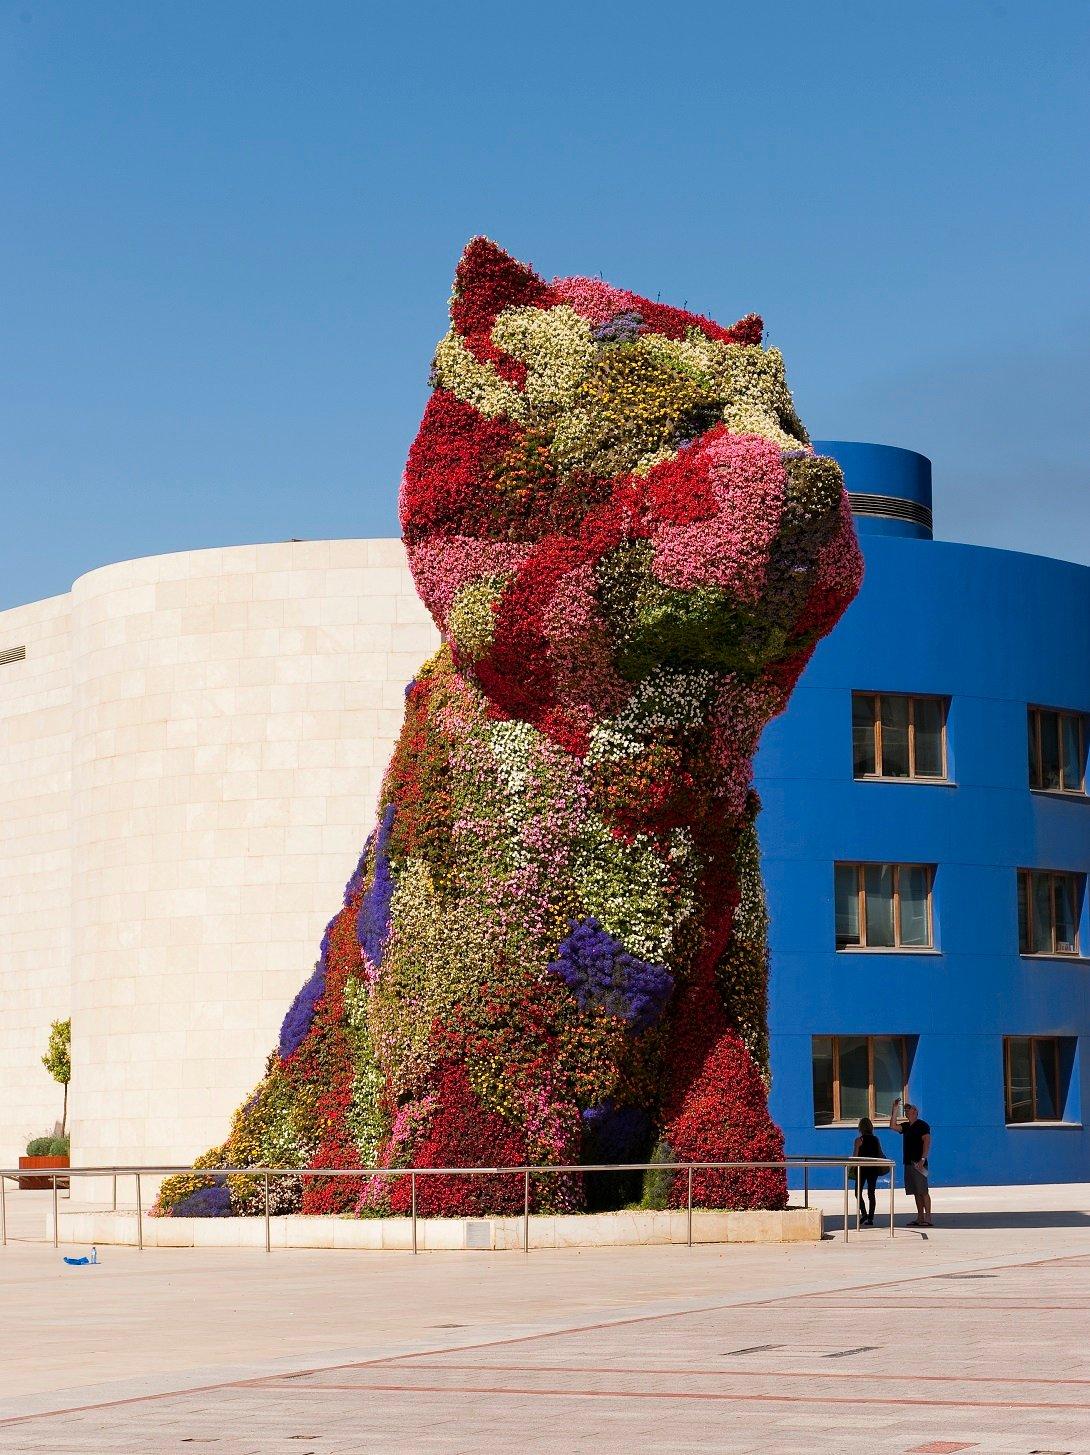 Jeff Koons, Puppy, Guggenheim museum, Bilbao